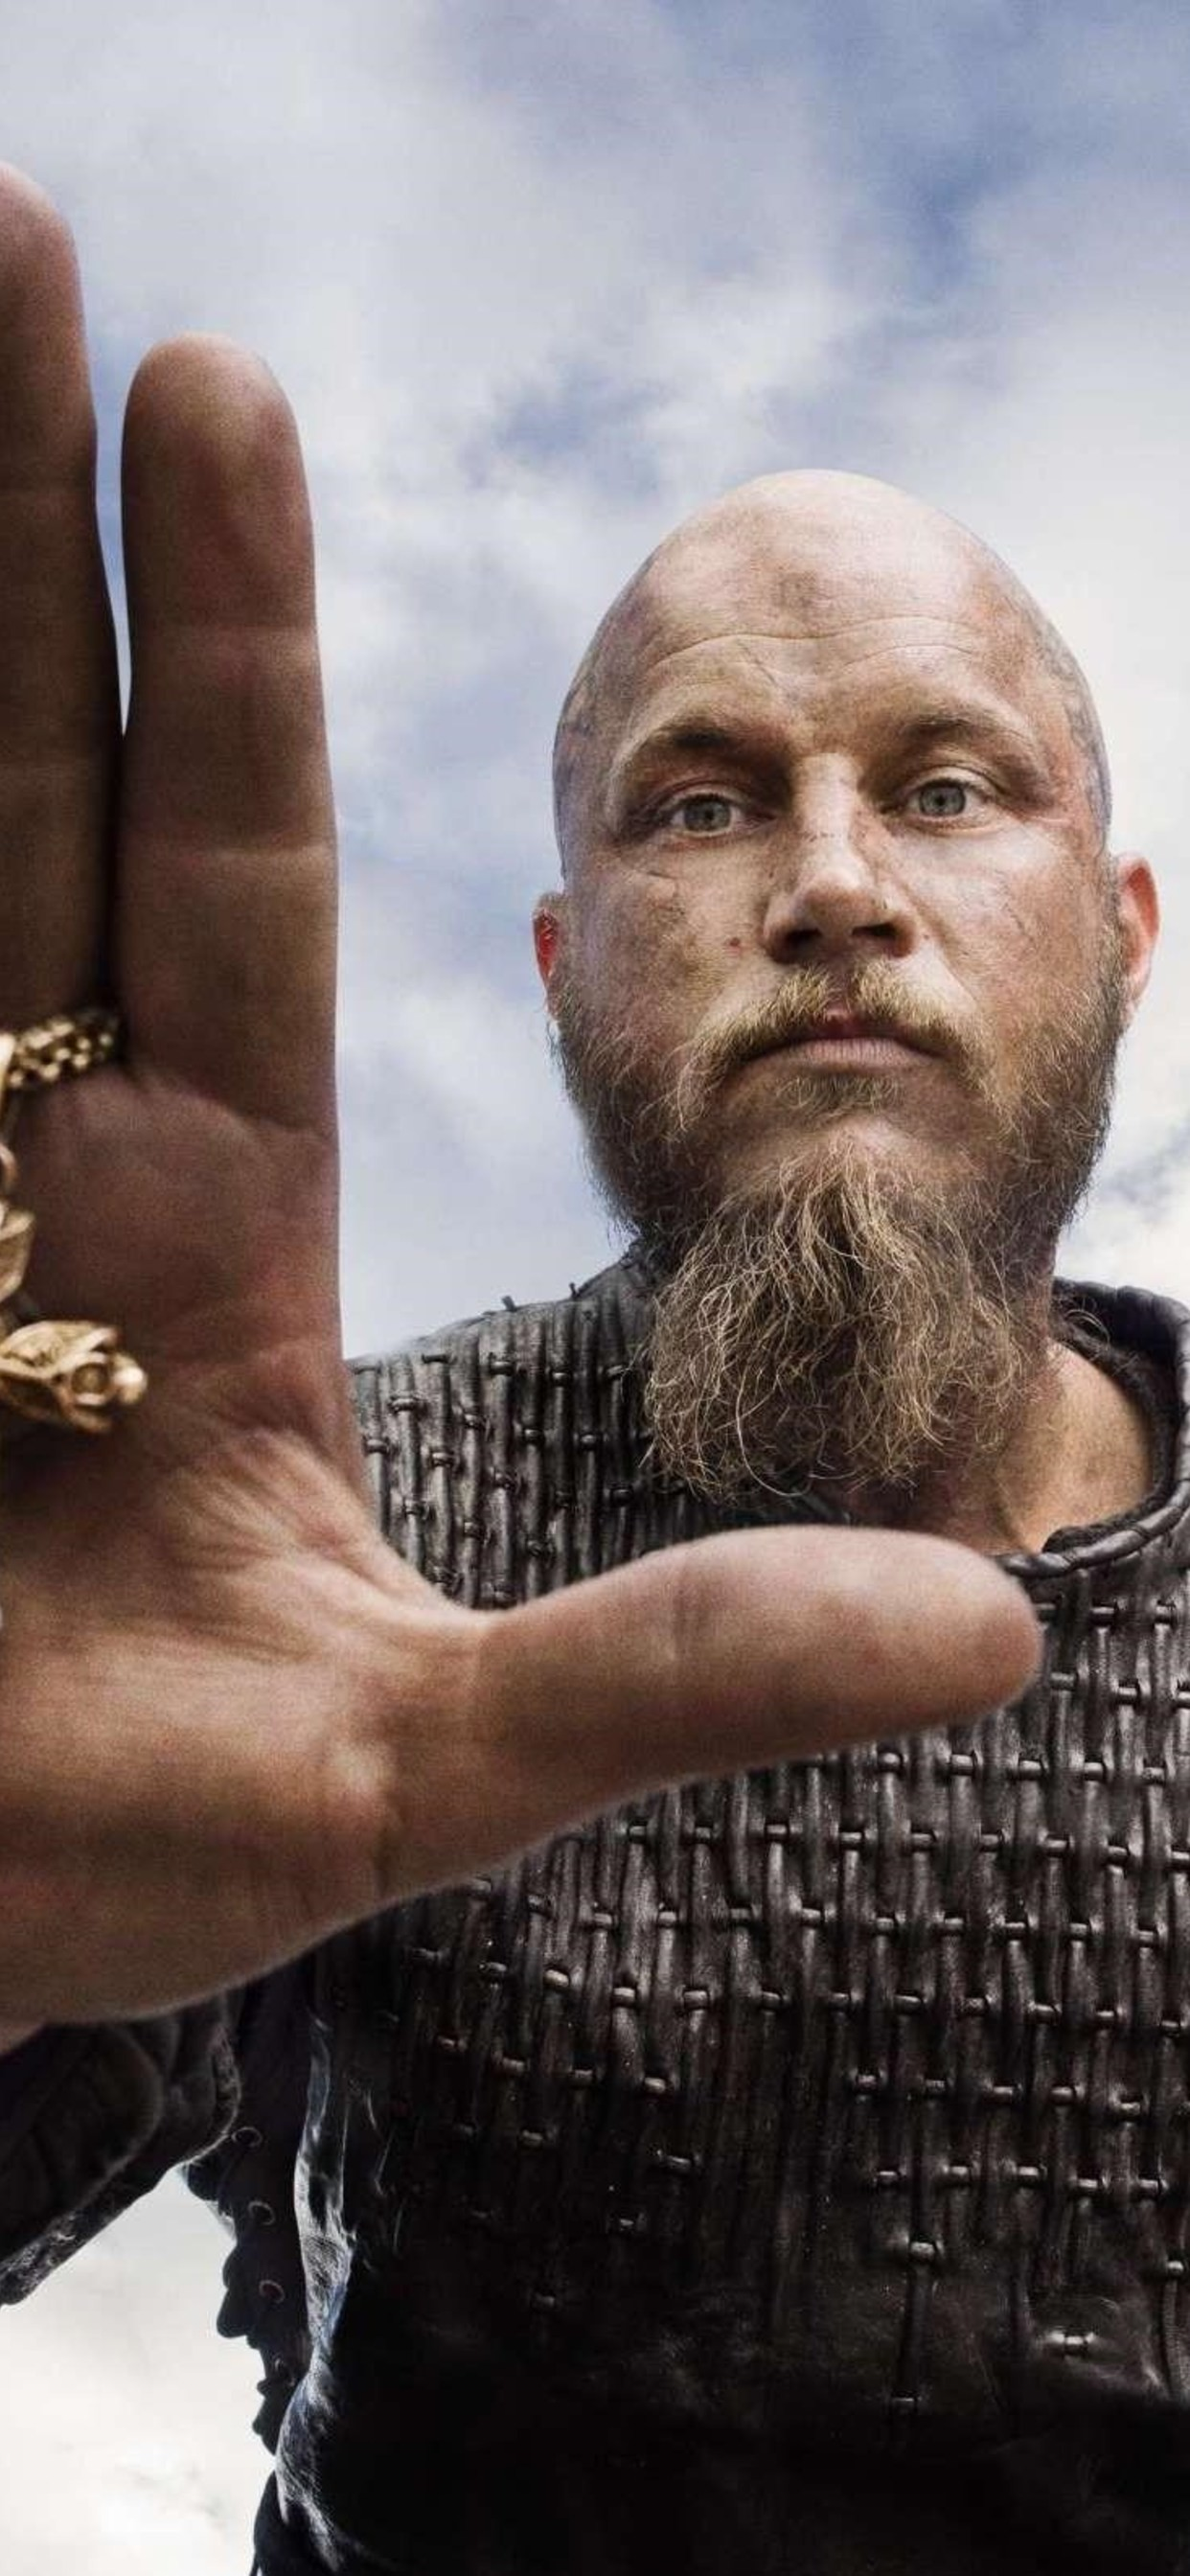 Ragnar Lodbrok In Vikings   Data Src Cool Vikings Iphone - Iphone 7 Wallpaper Ragnar - HD Wallpaper